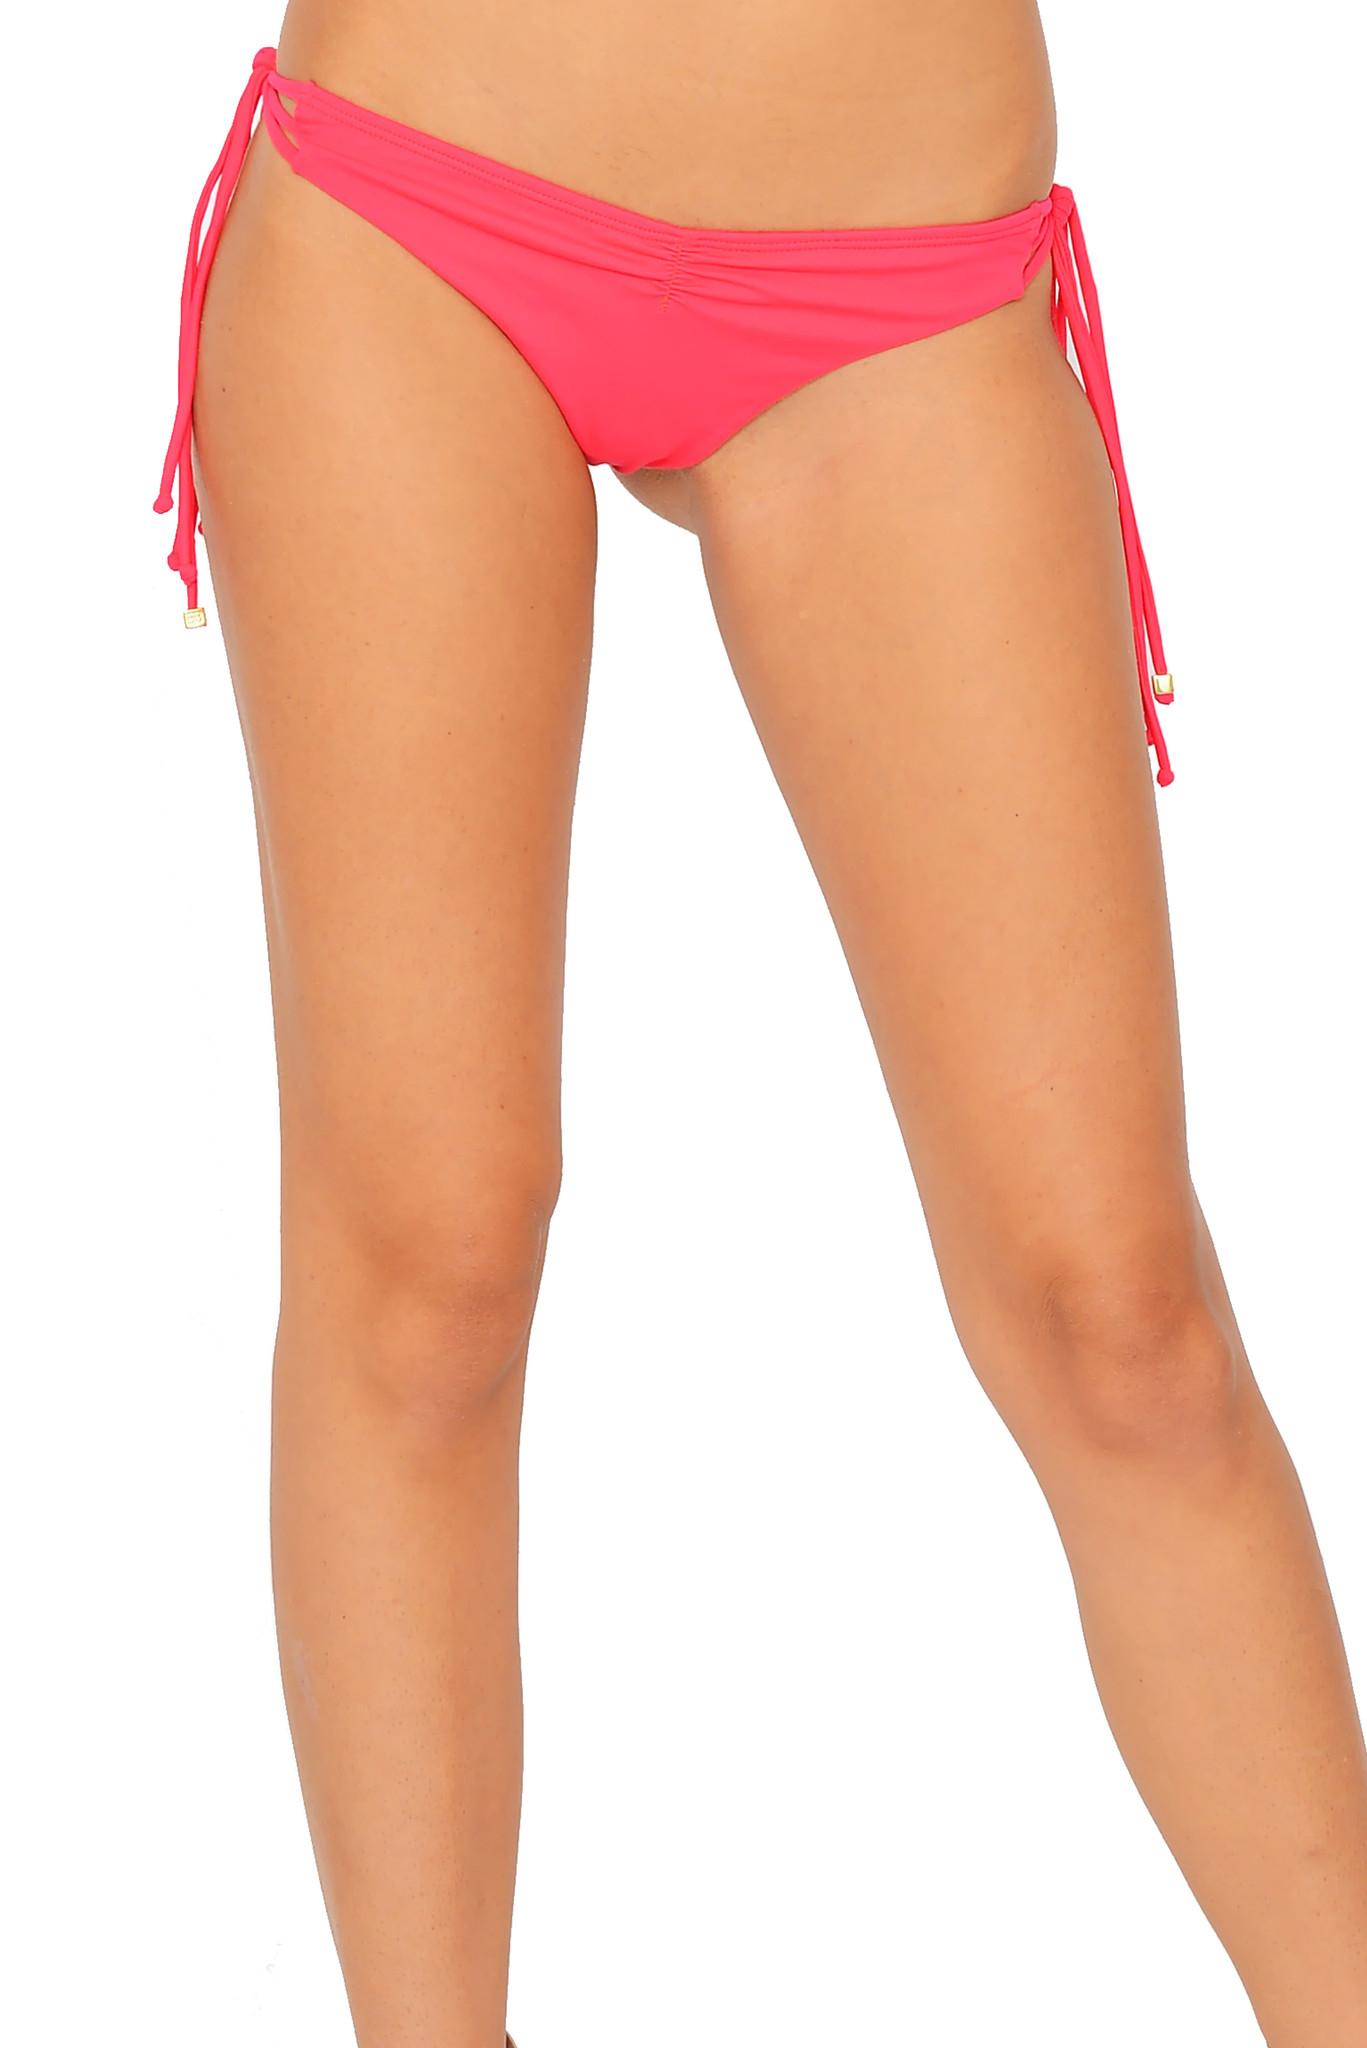 4514de7ea8 Del mar Aurora Triangle Bikini Bottom In Azalea Pink in